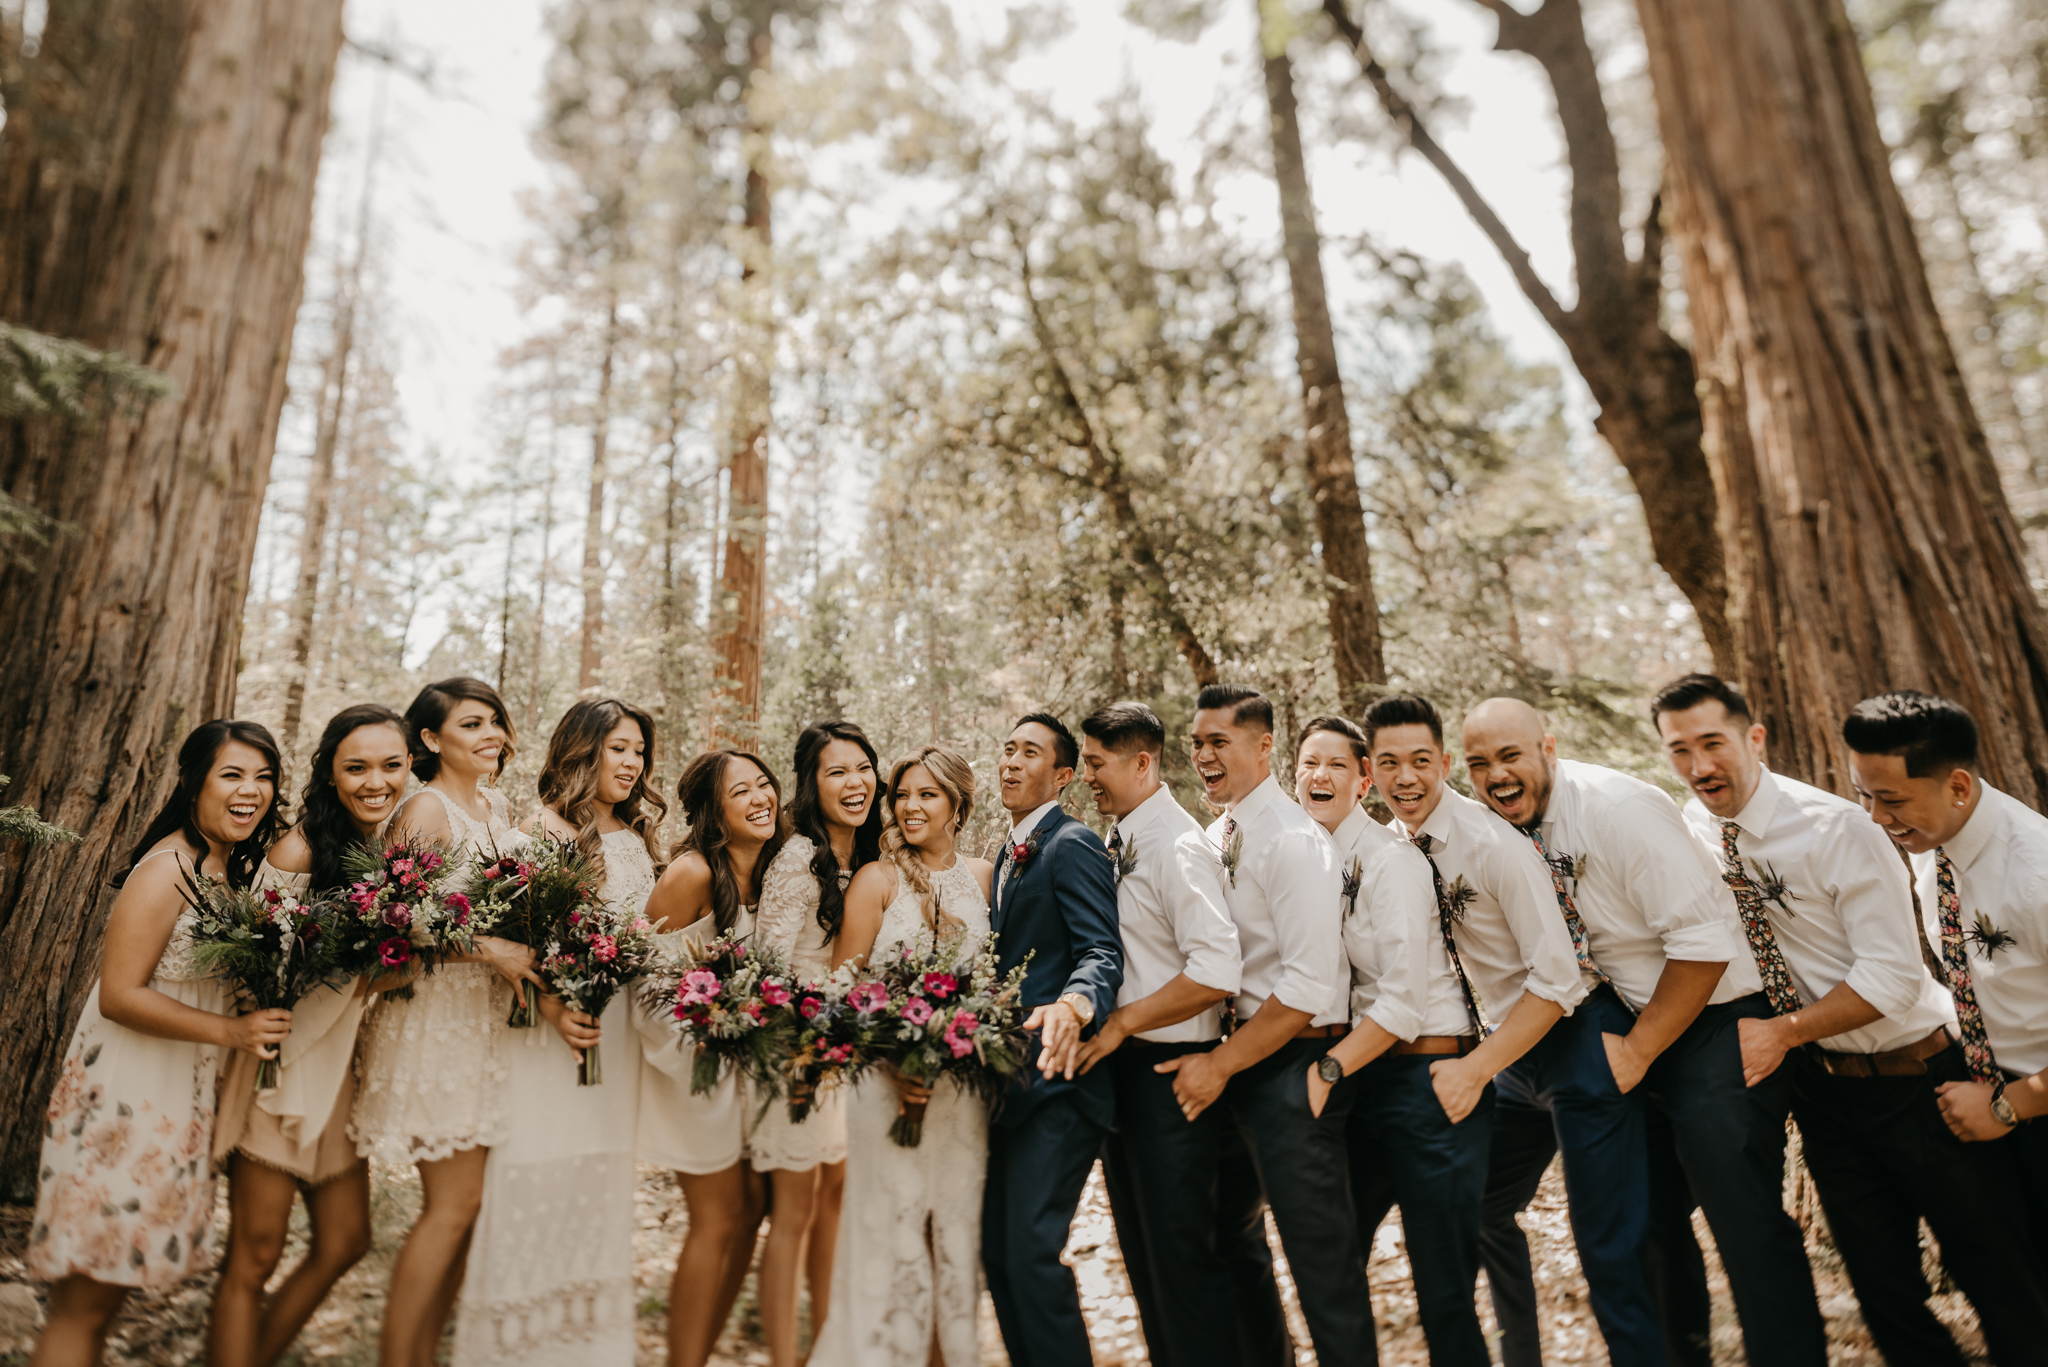 © Isaiah + Taylor Photography - Evergreen Lodge Destination Yoesmite Wedding - Los Angeles Wedding Photographer-092.jpg